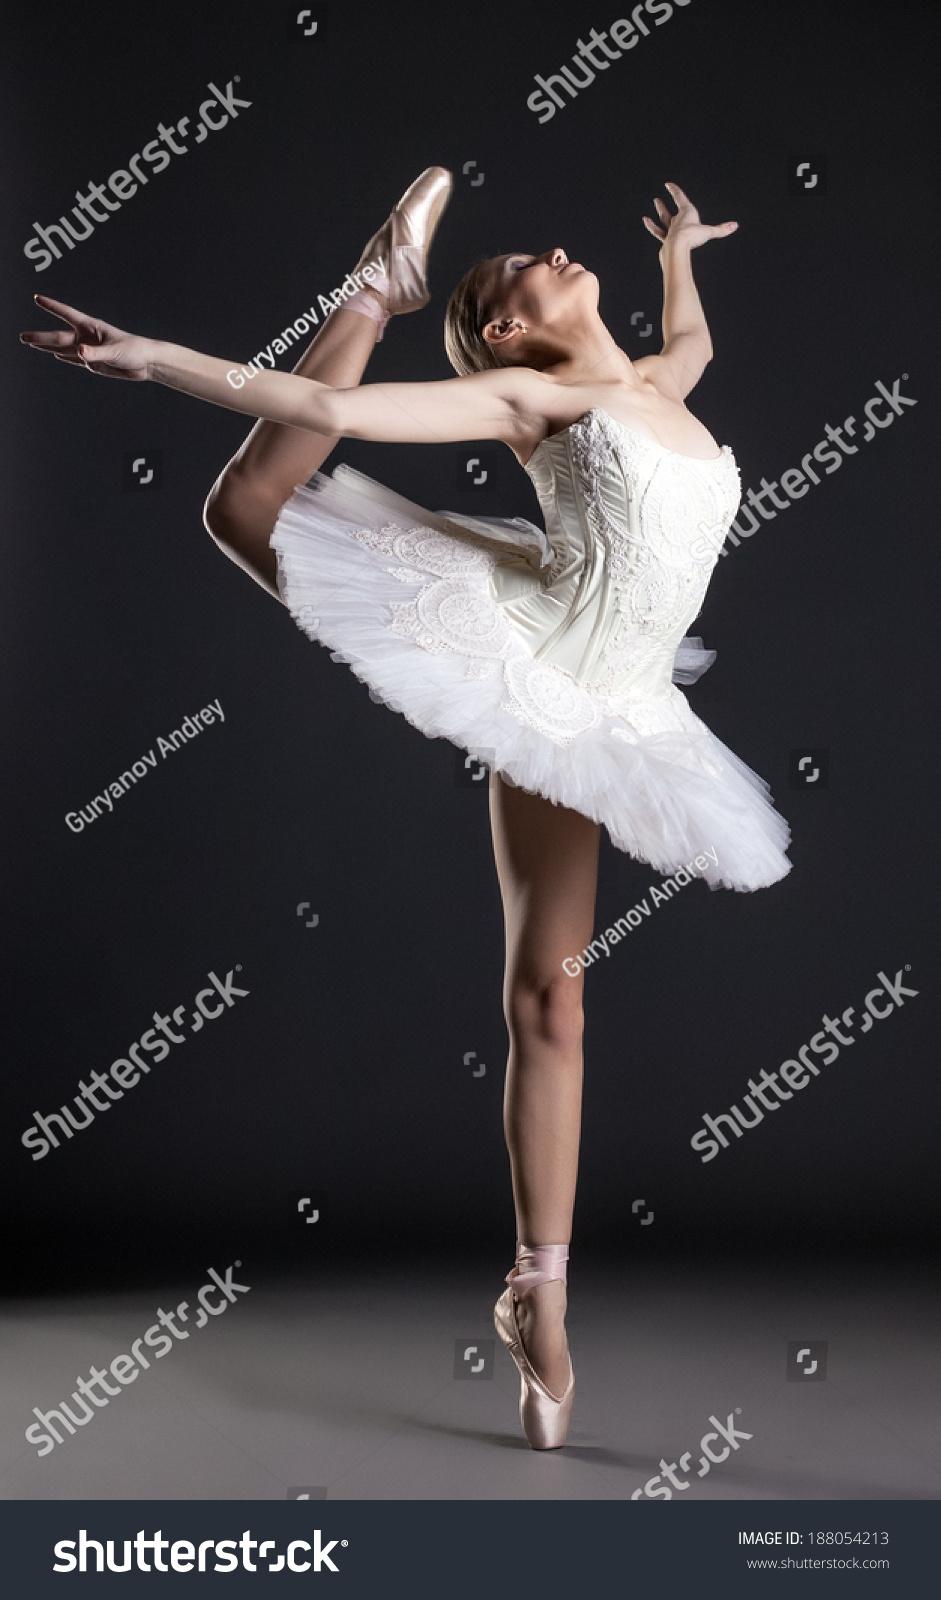 Flexible Dancer Exercising On Pole In Studio Stock Photo